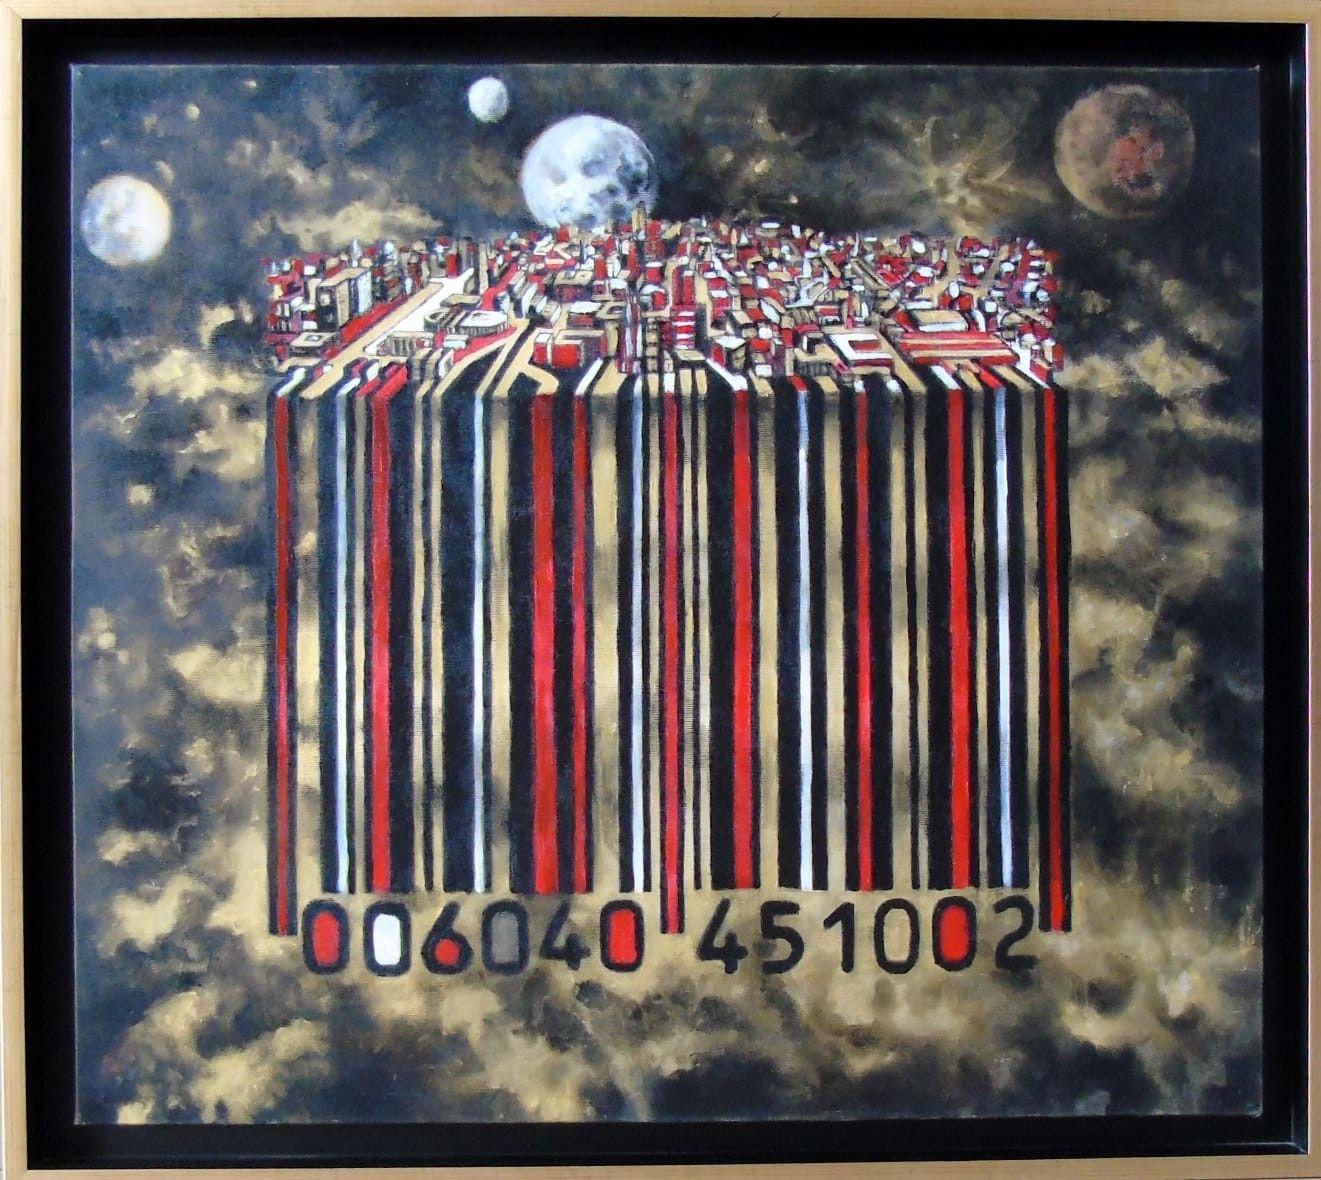 OLIO SU TELA  SEBASTIAN DE GOBBIS ' CODECITY@GOLDWORLD '  dimensioni L 73 x H 65 cm.